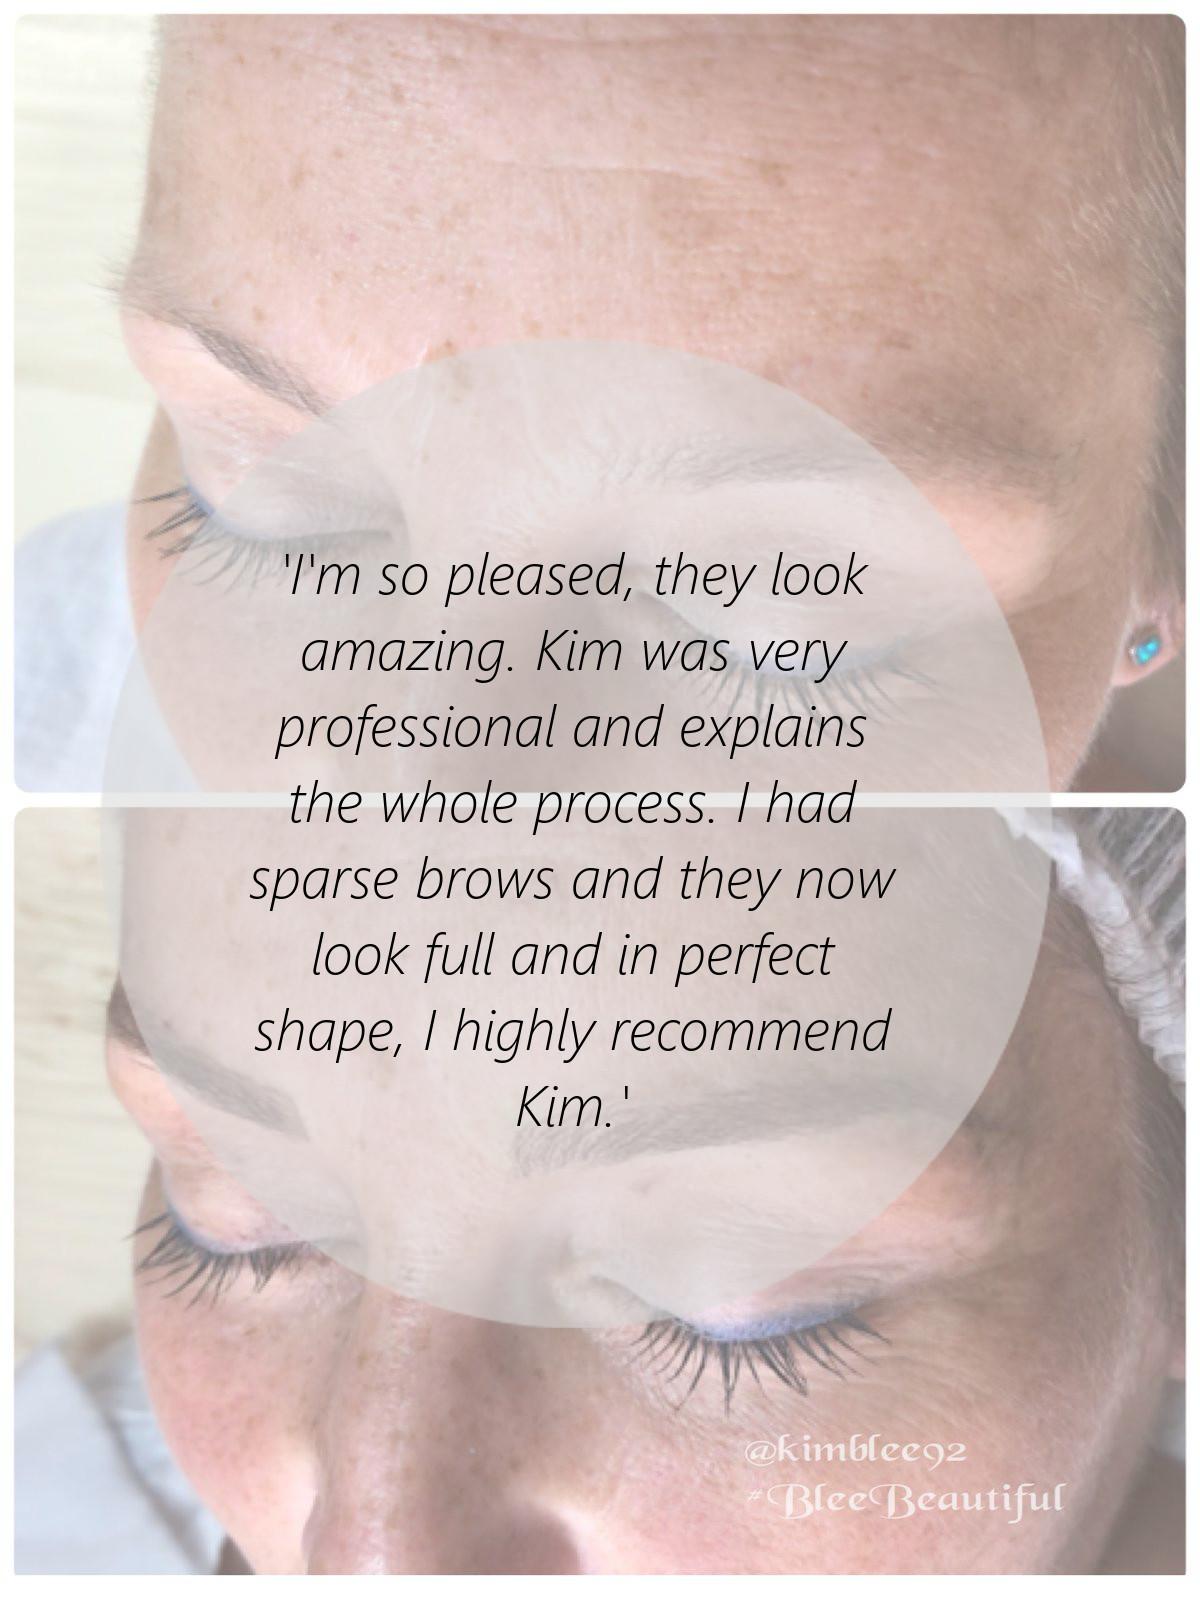 Venus-Beauty-Hair-Salon-Tavistock-Devon-Kim-Pope-Microblading-New-Appointments-Available-Review.JPG